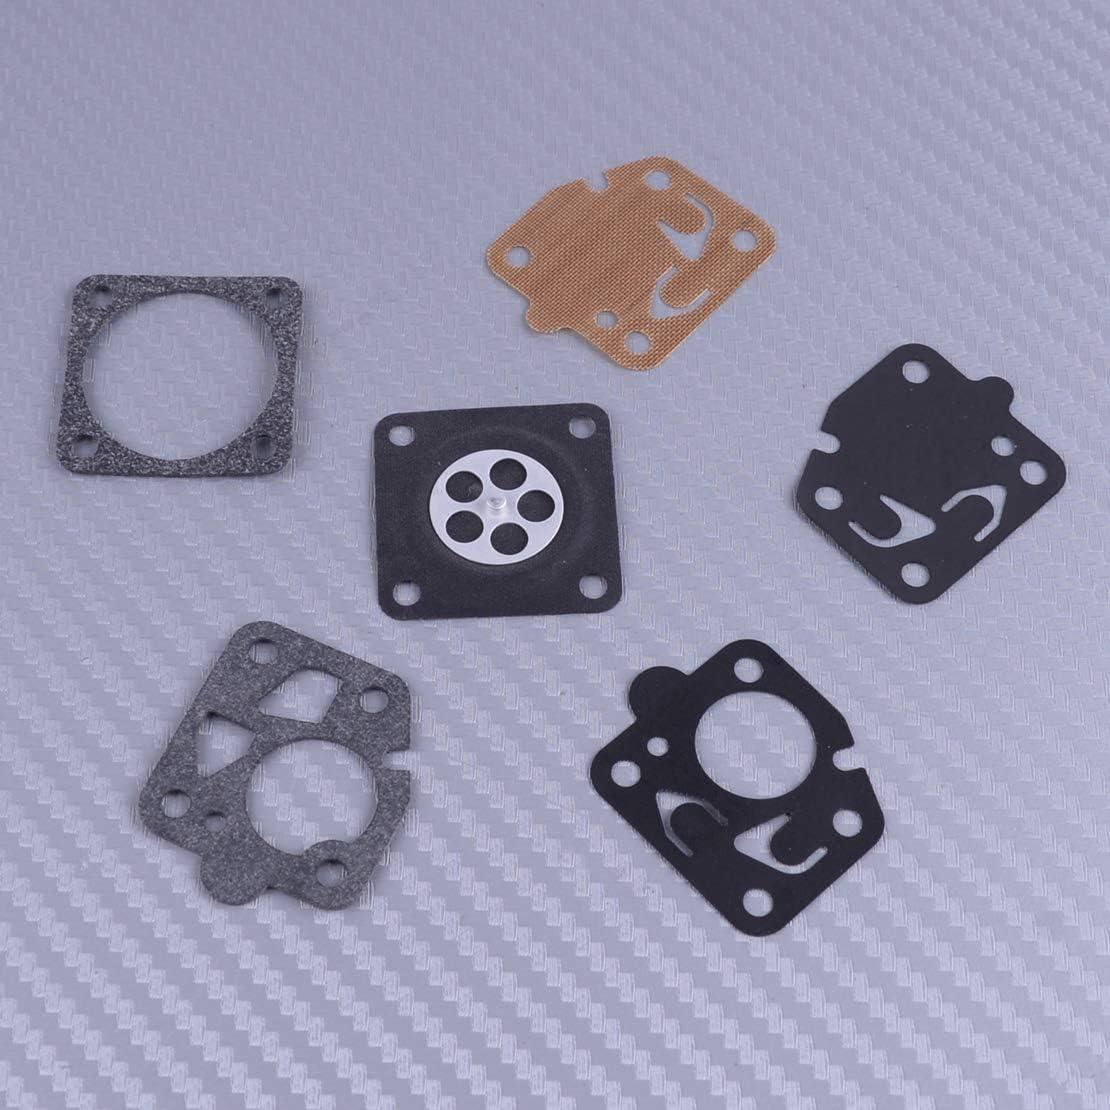 Eastar Vergaser Vergaserdichtung Reparatur Umbausatz Für Kawasaki Tg18 Tg20 Tg24 Tg28 Tg33 Tf22 Küche Haushalt